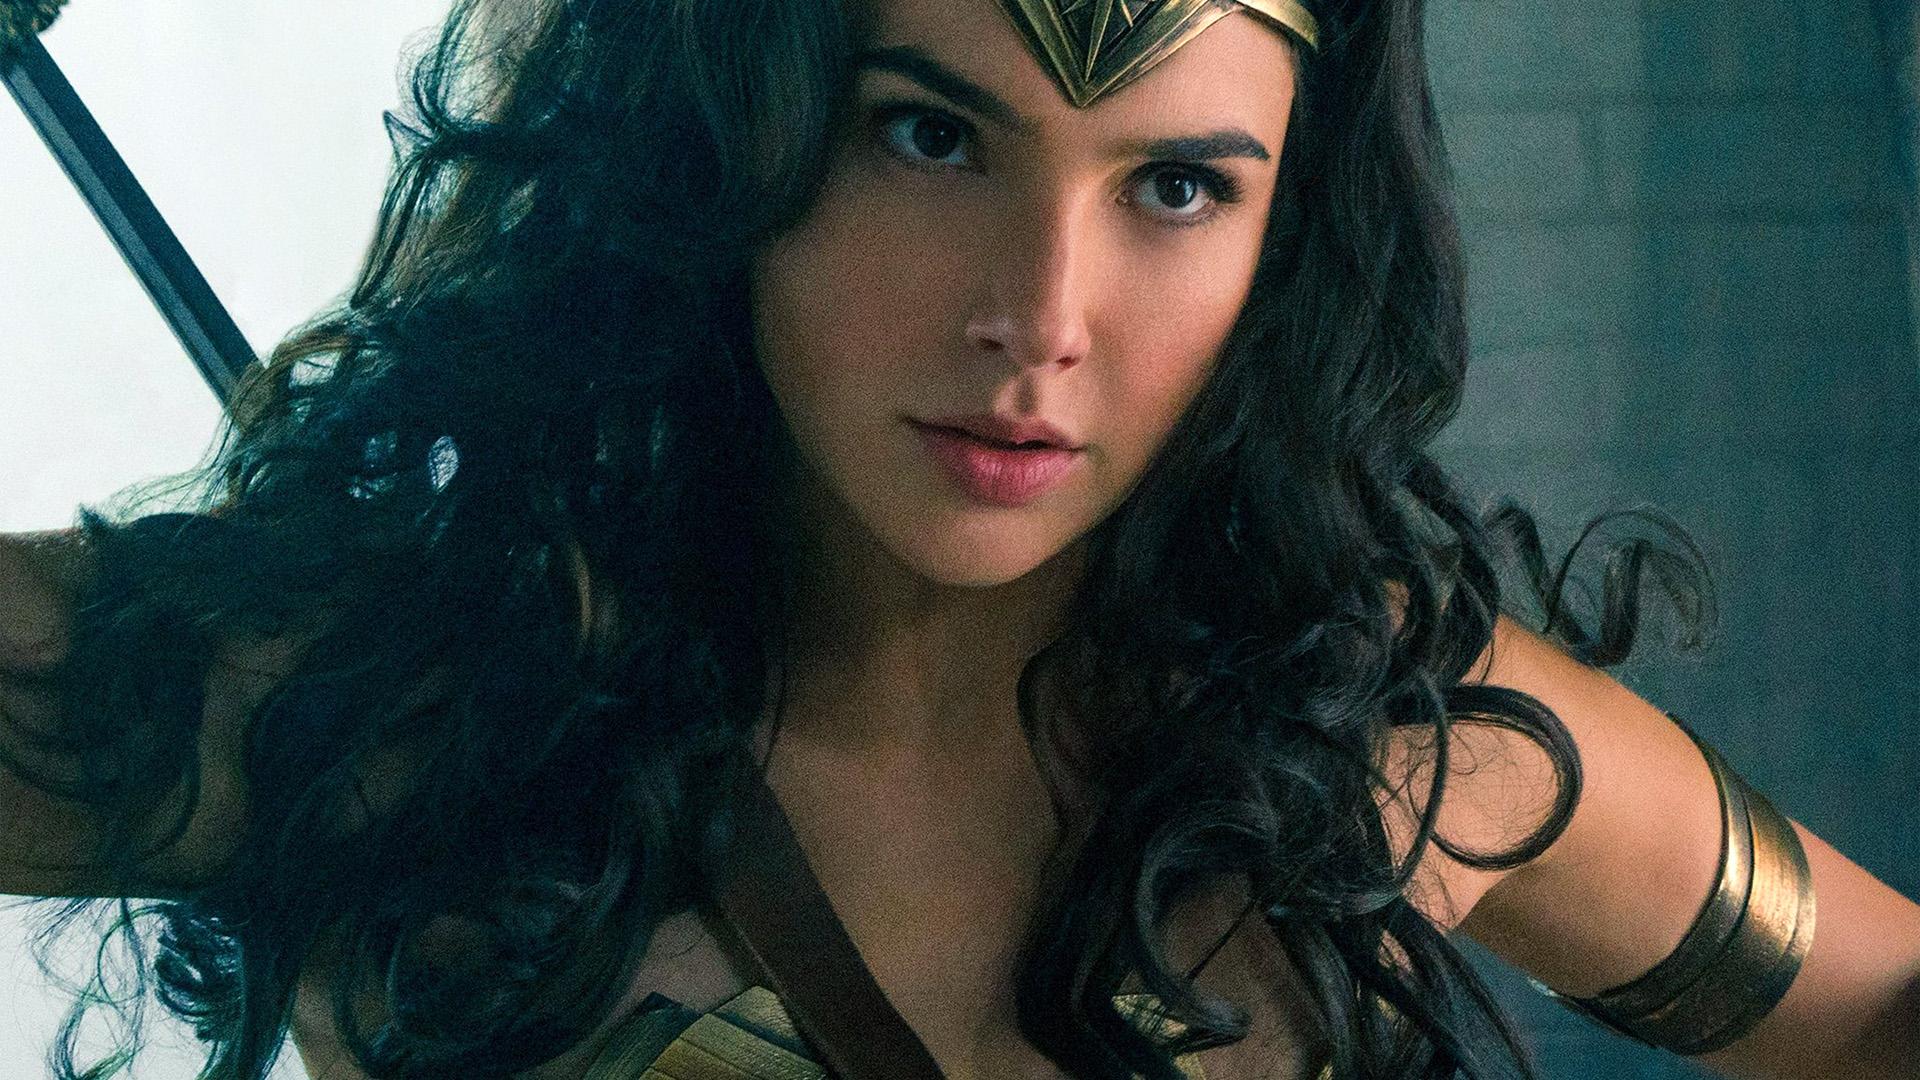 1280x1024 Wonder Woman Movie 1280x1024 Resolution Hd 4k: Az63-galgadot-wonderwoman-hero-illustration-art-wallpaper